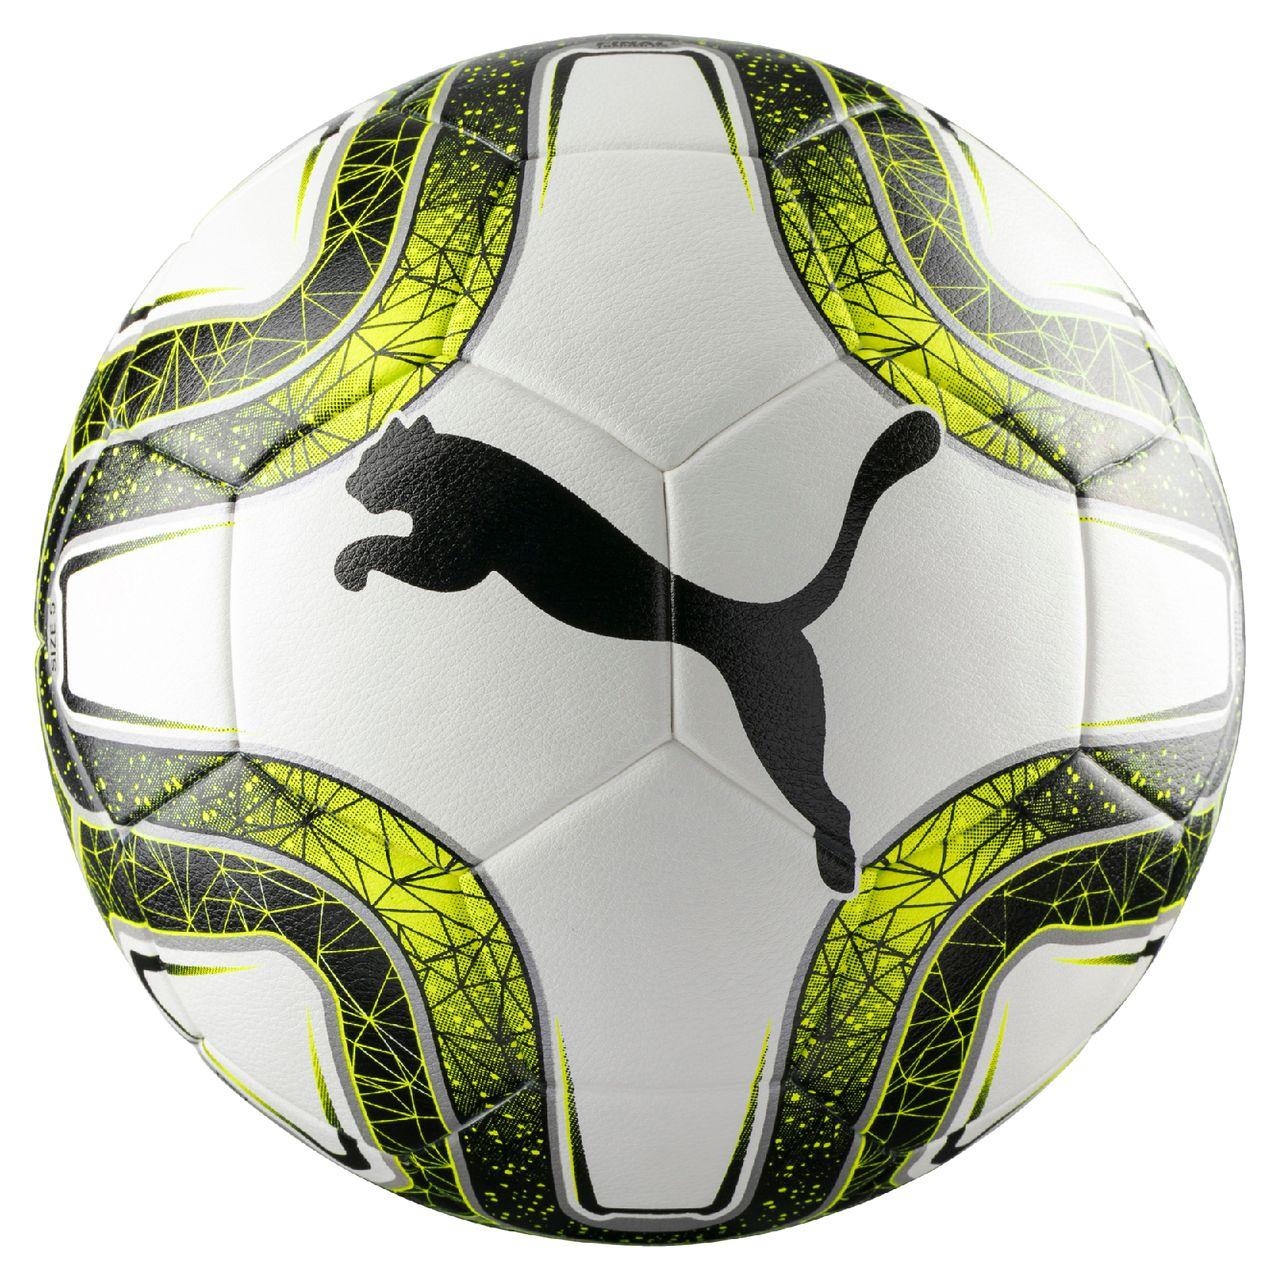 10 x PUMA Trainingsball - FINAL 5 Hardground inkl. Ballsack